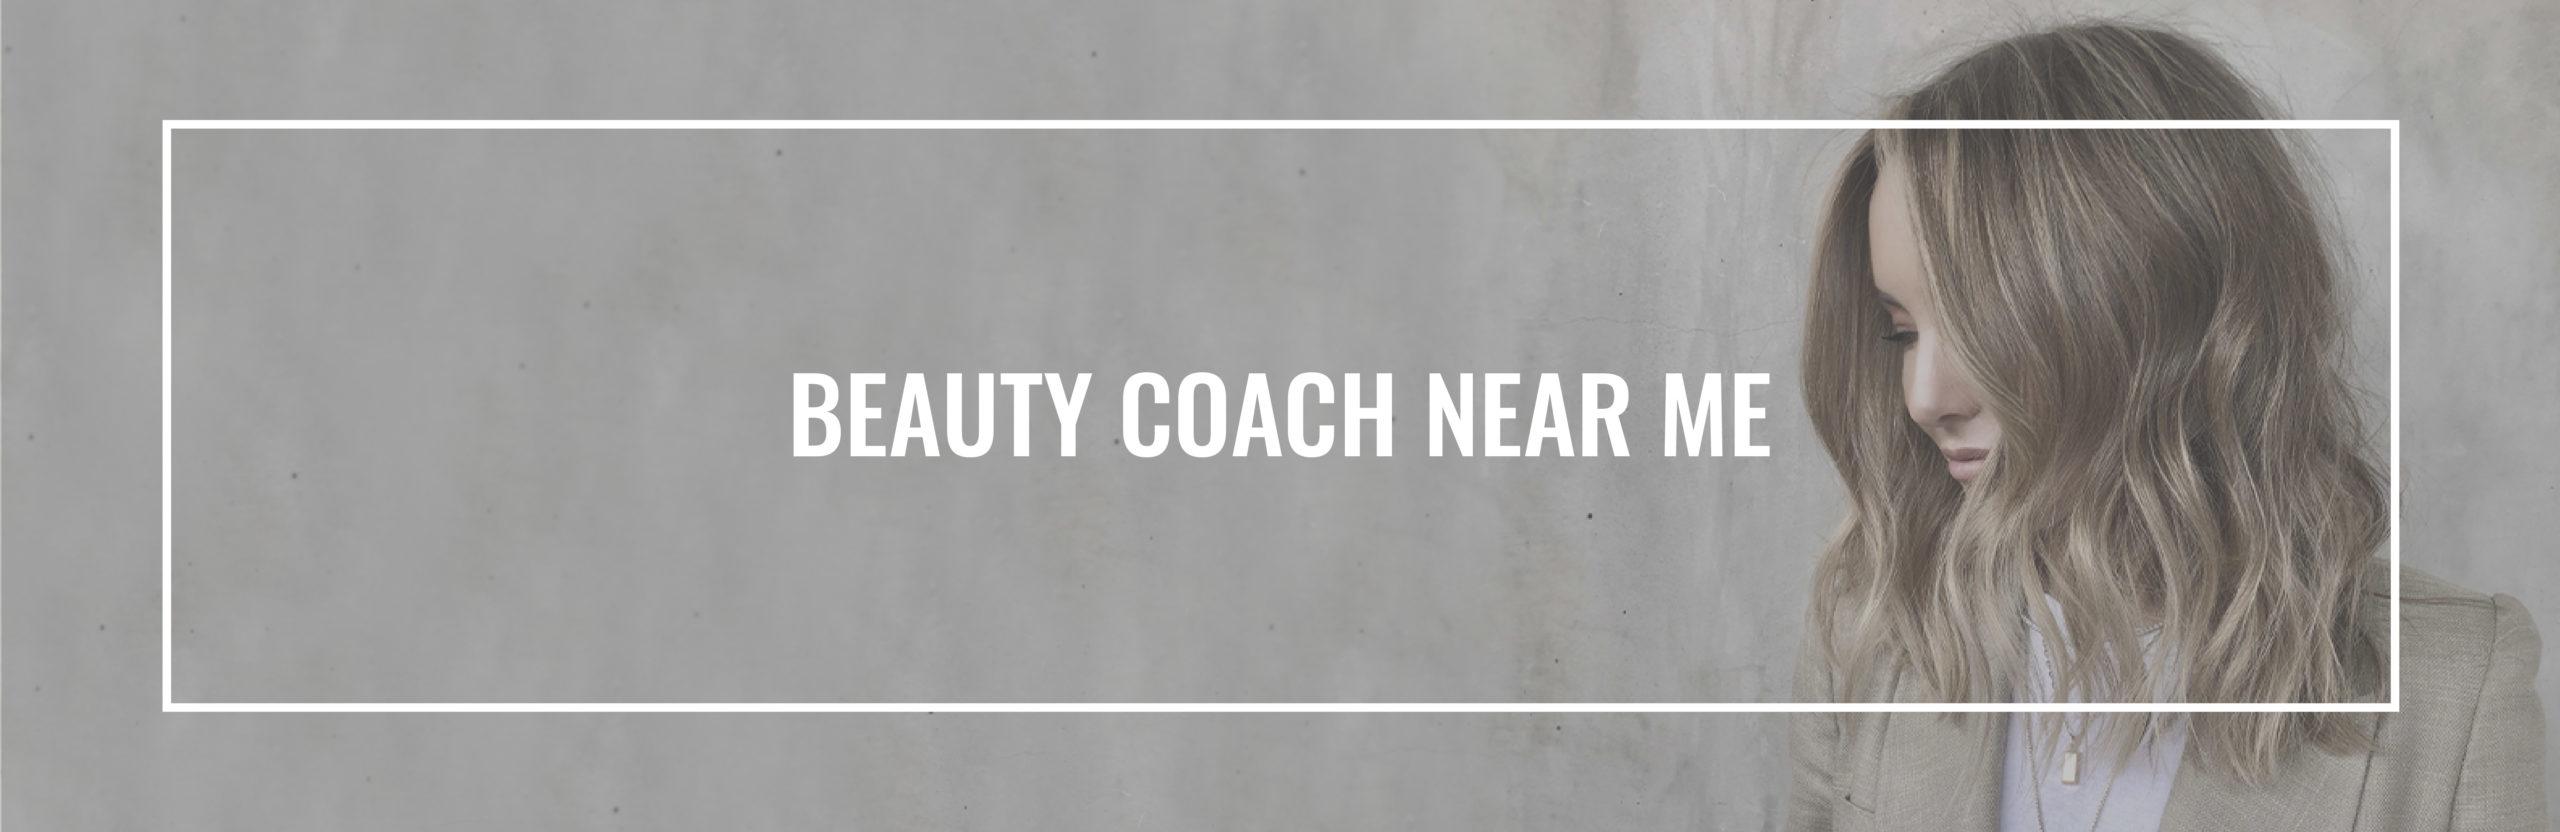 Beauty Coach Near Me-01